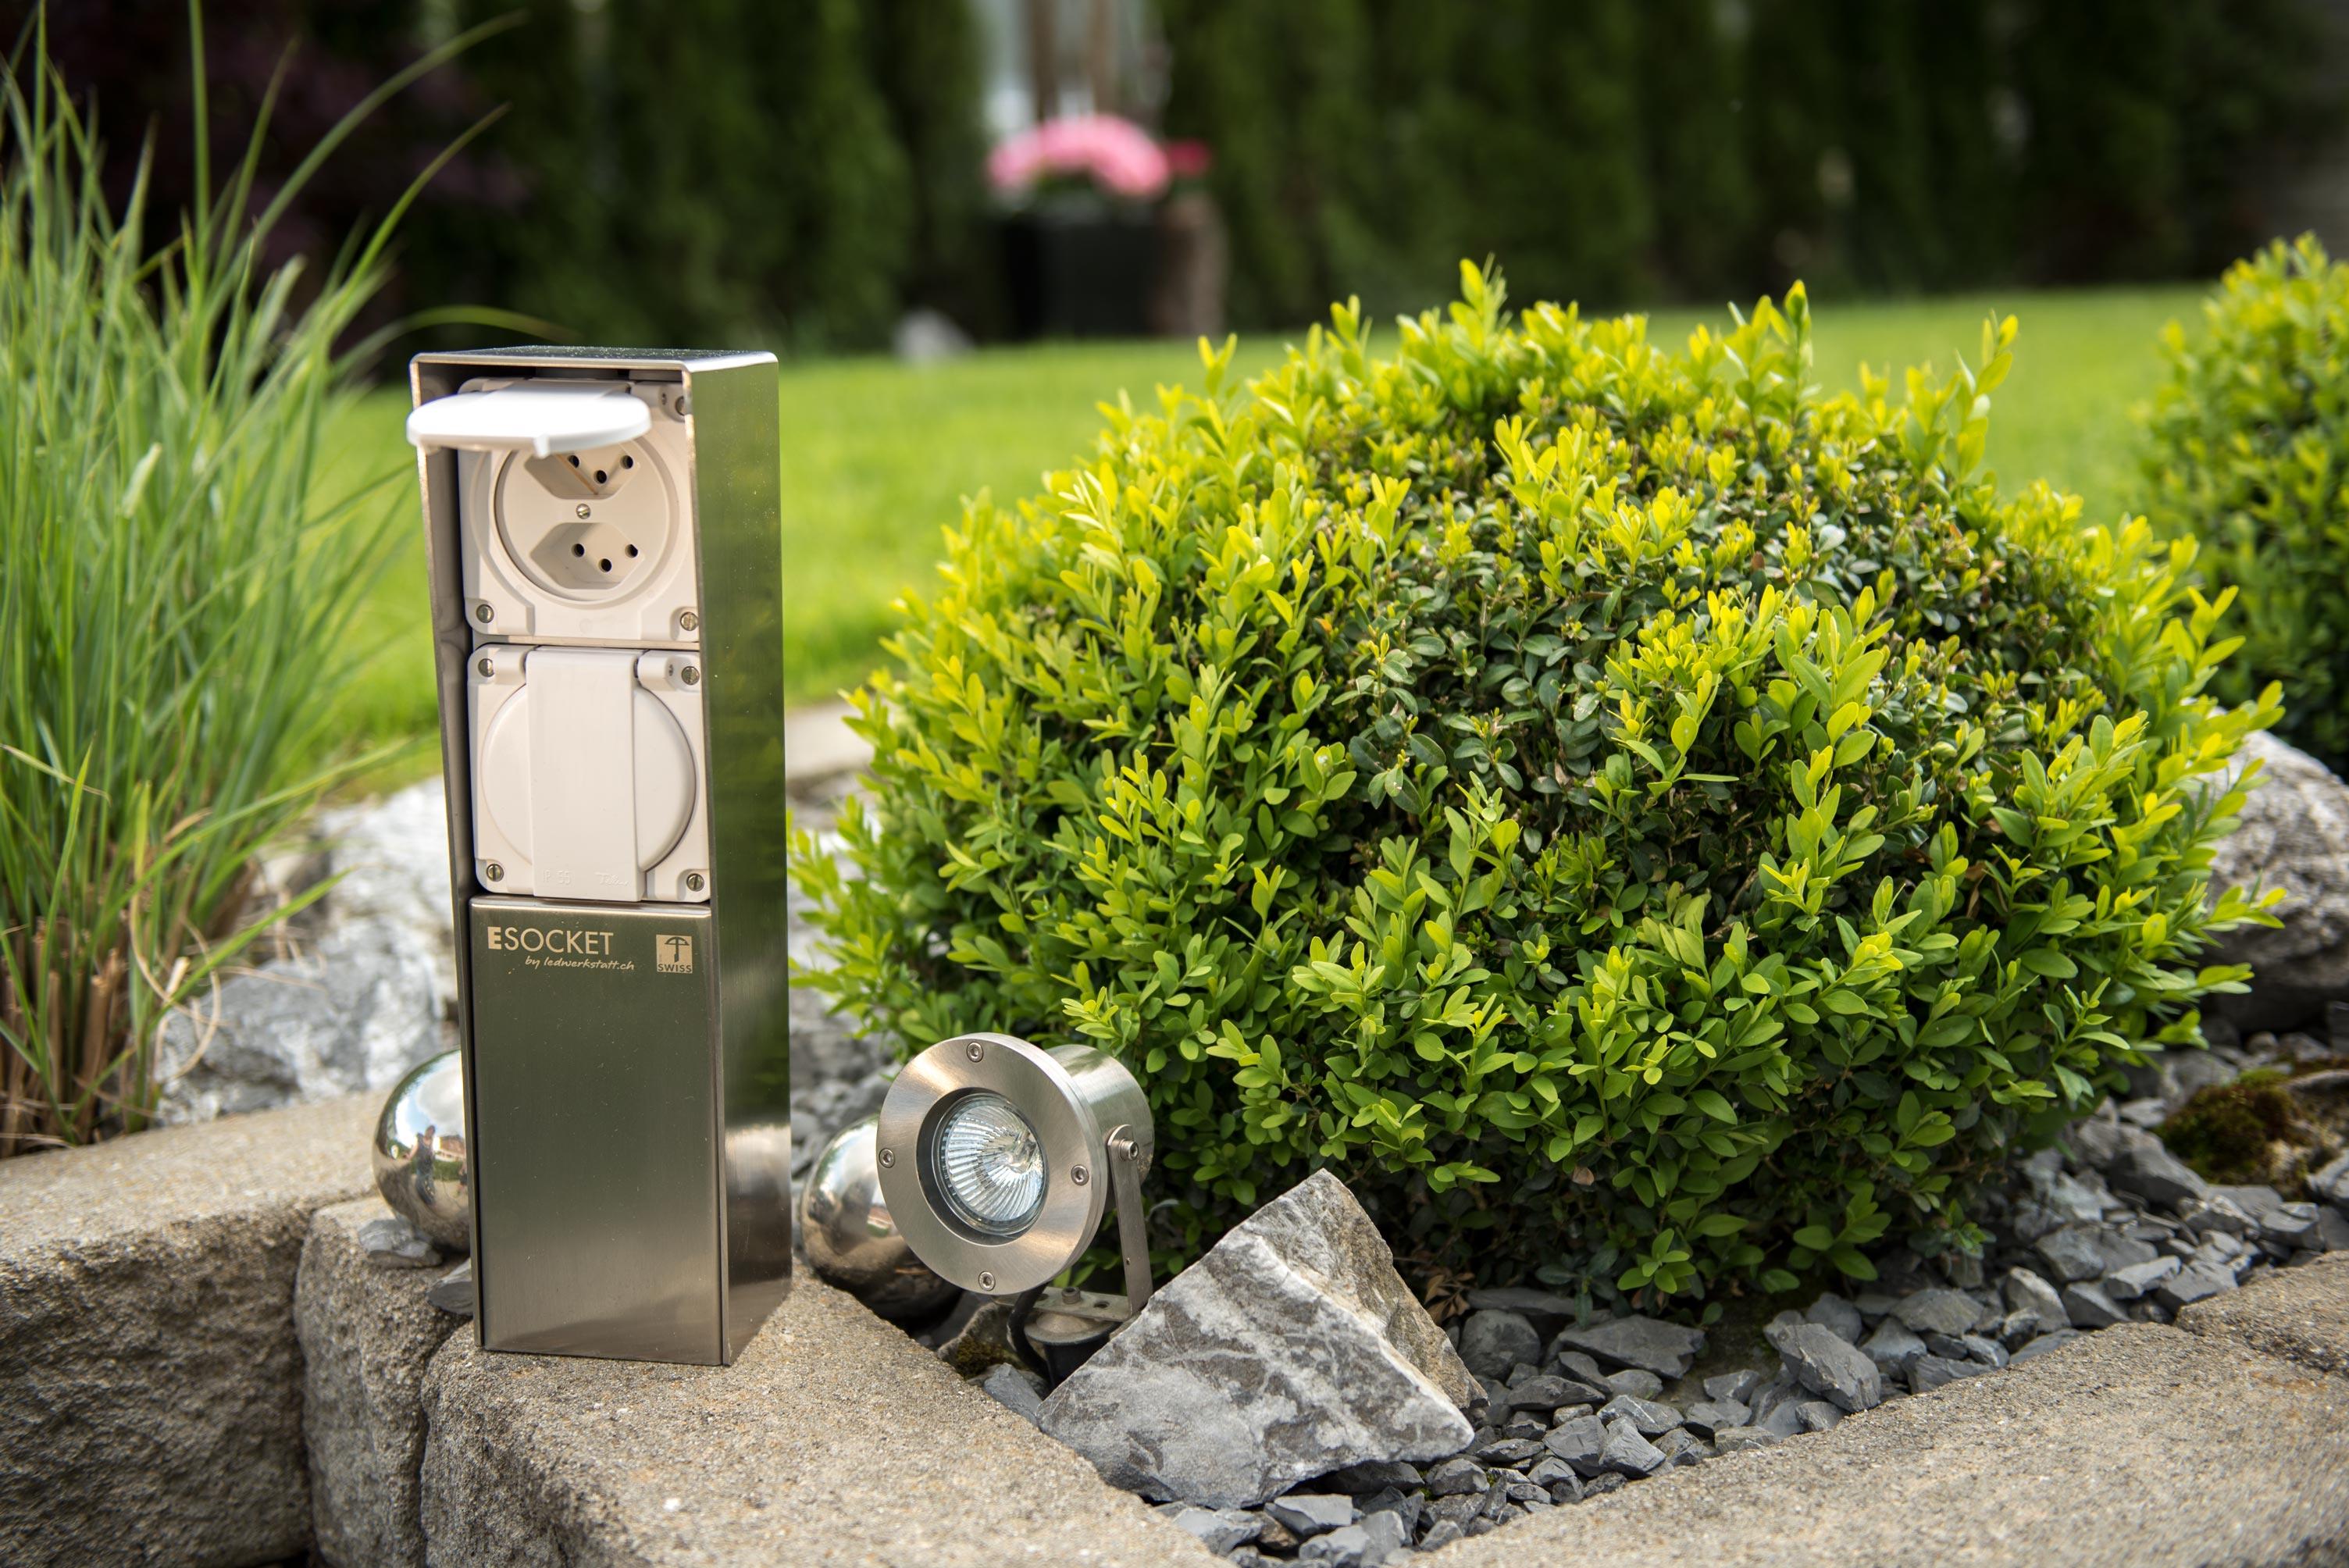 Steckdosensockel Esocket 350 Gartenstromverteiler Mit Feller Edizio